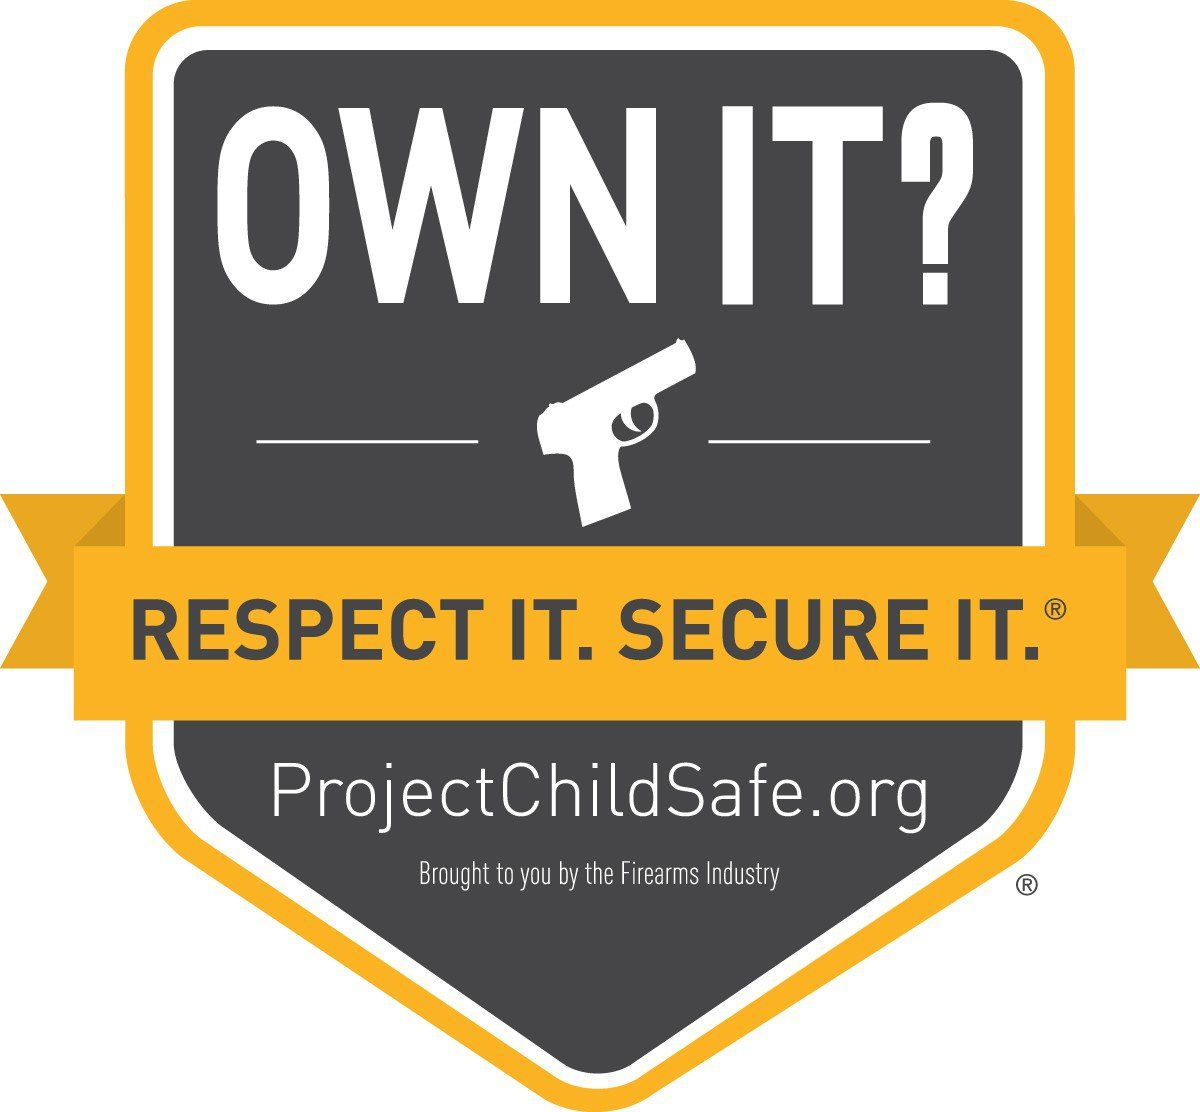 projectchildsafe.org